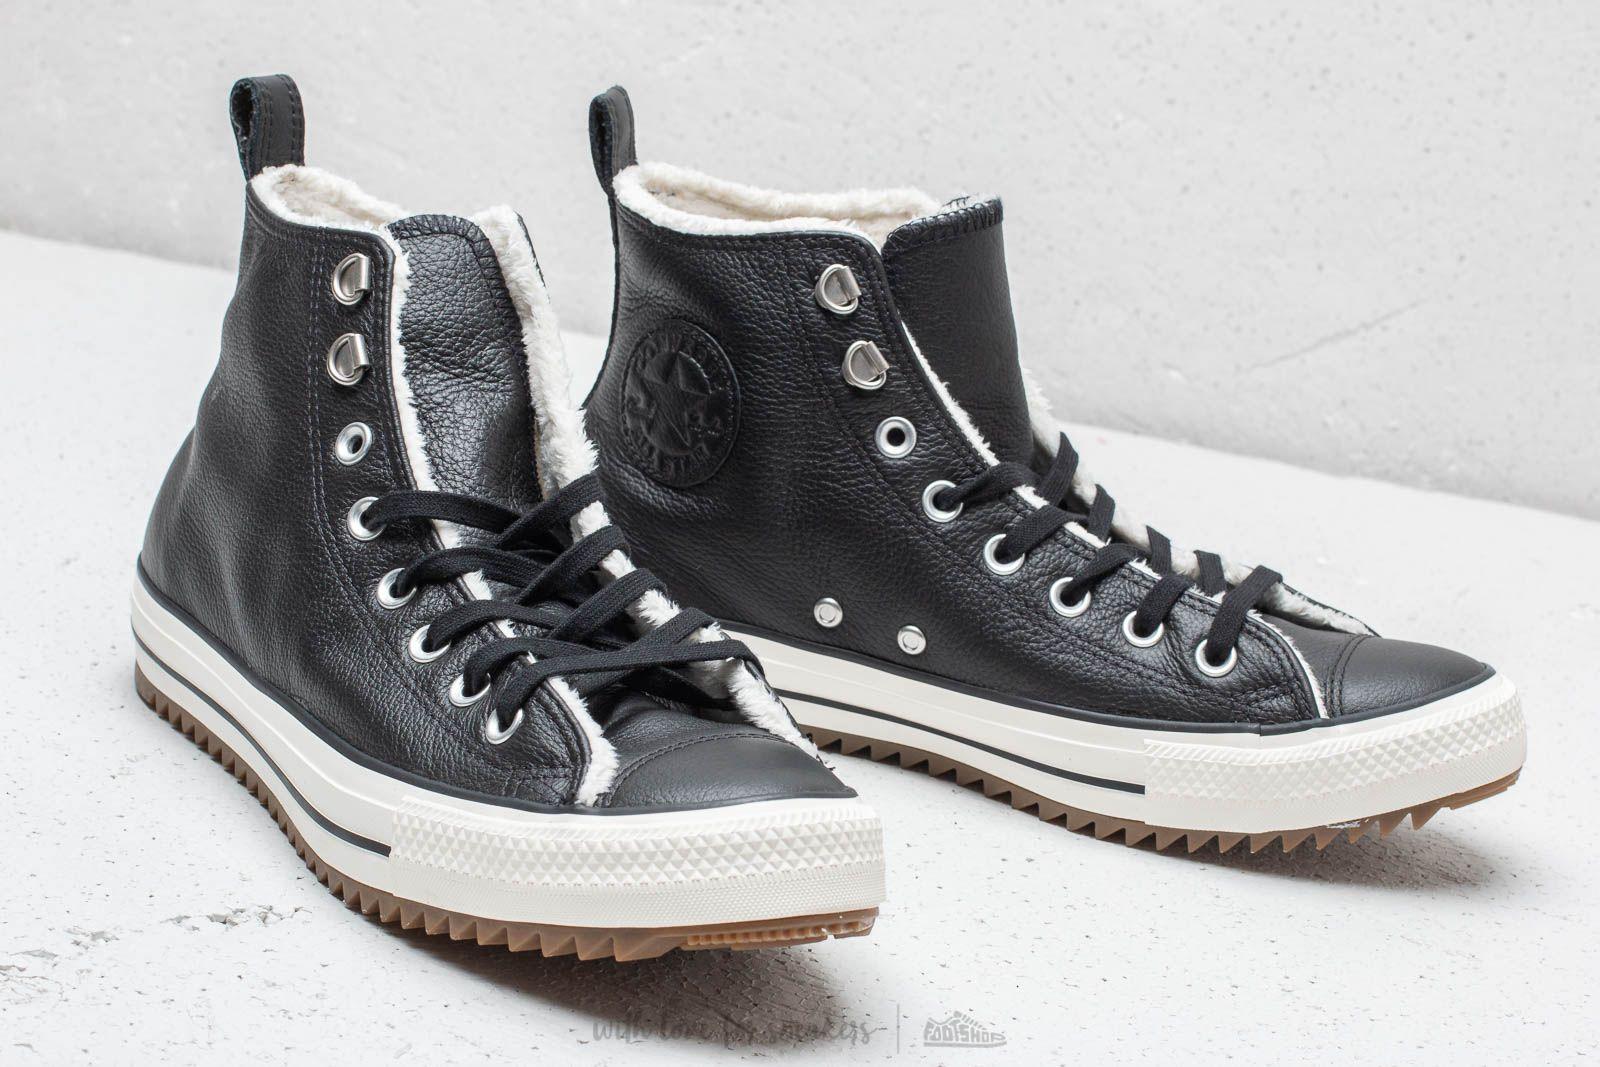 Converse Chuck Taylor All Stars Hiker Boot High Black  Egret  Gum at a great 5e9b4276219